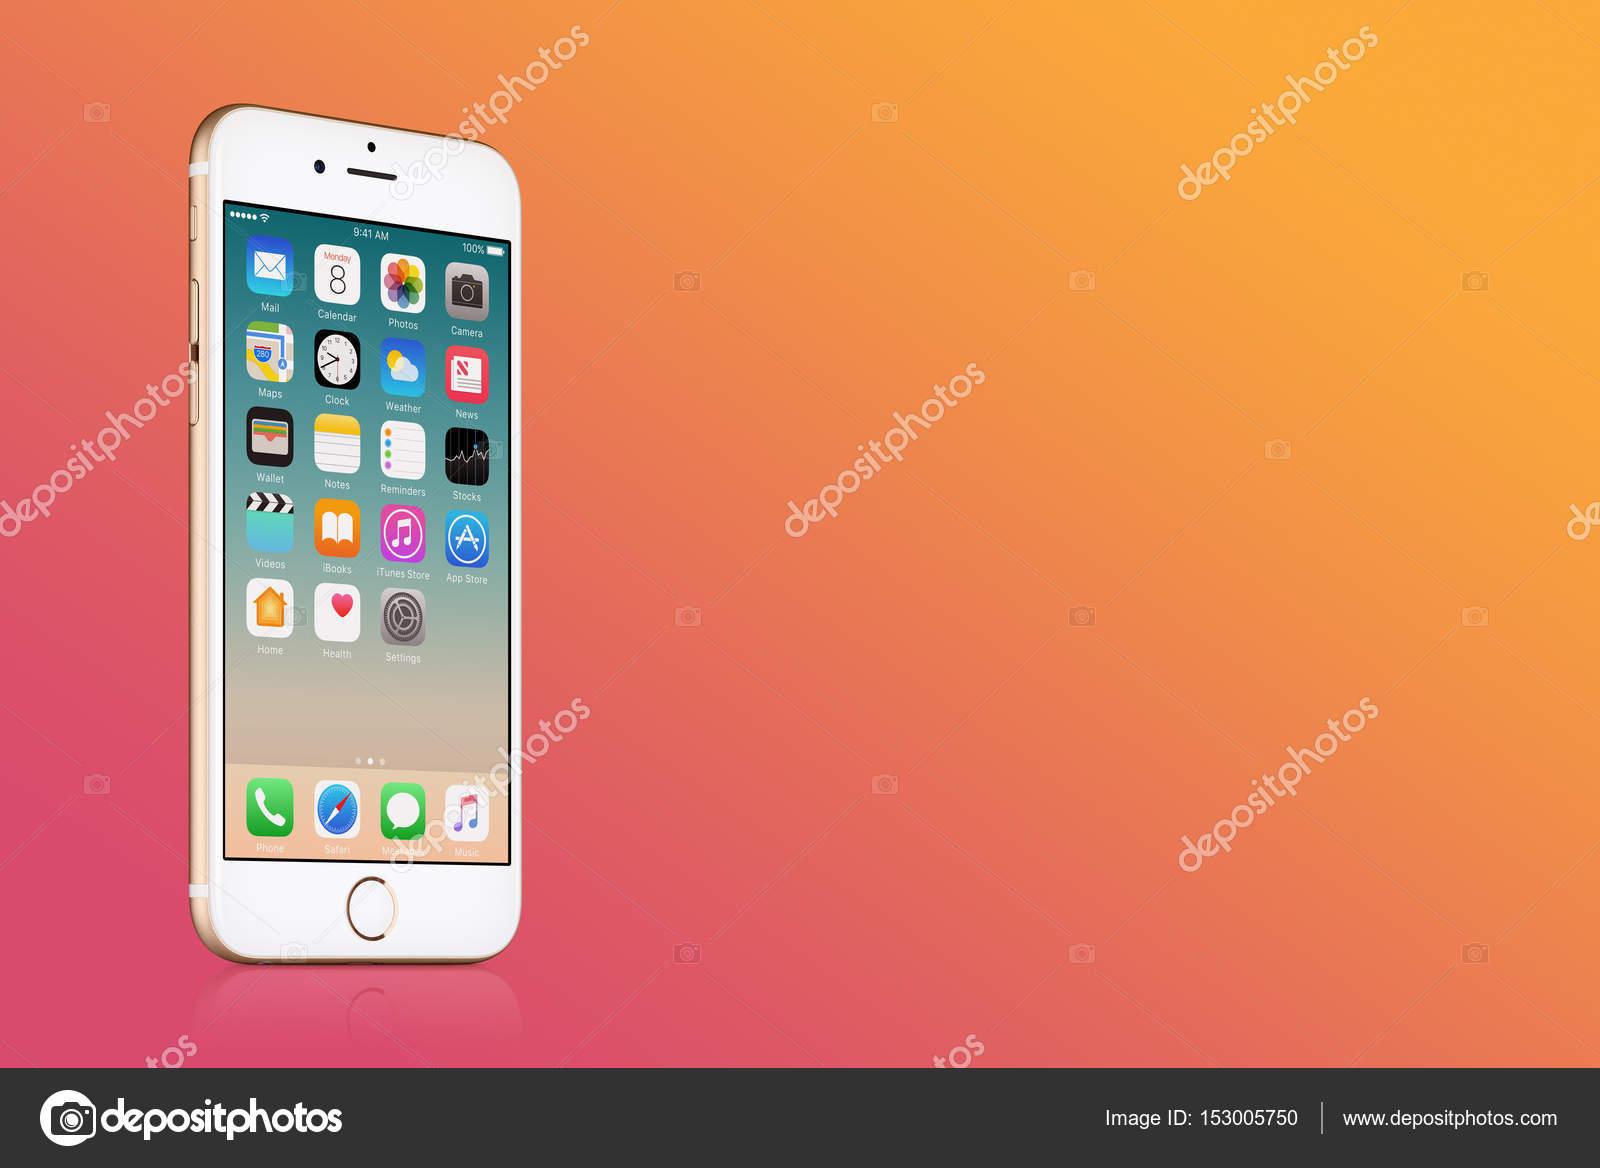 Fotografie Sfondi Oro Rosa Iphone Iphone Apple Oro 7 Con Ios 10